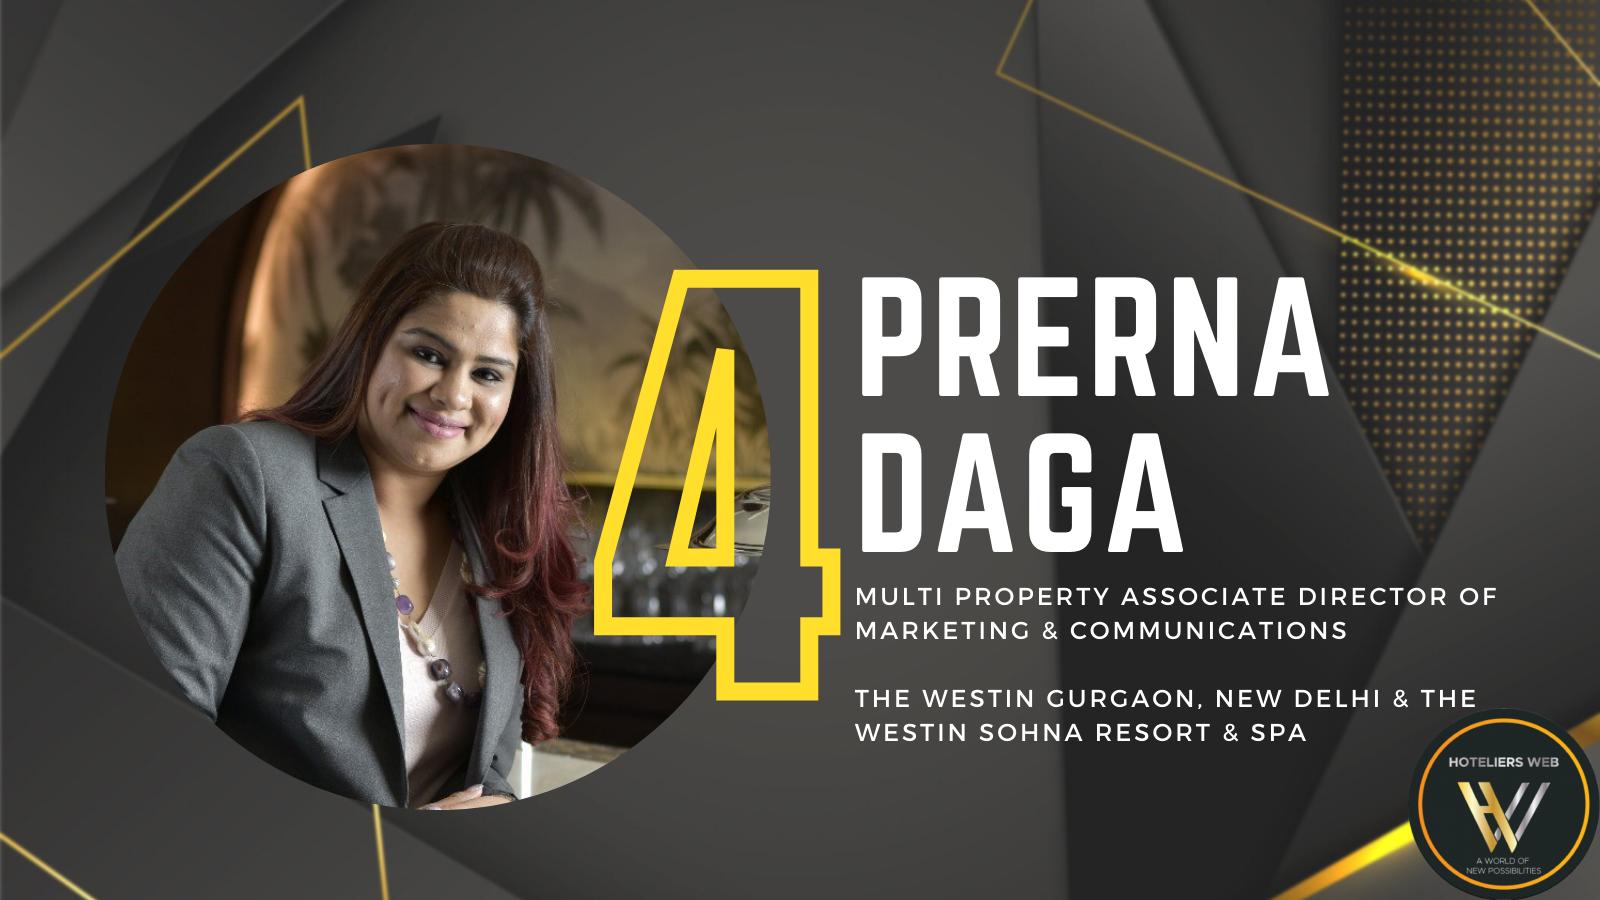 Prerna Daga – Ranked 4 on Power 25 Marketing & PR 2021 by Hoteliers Web